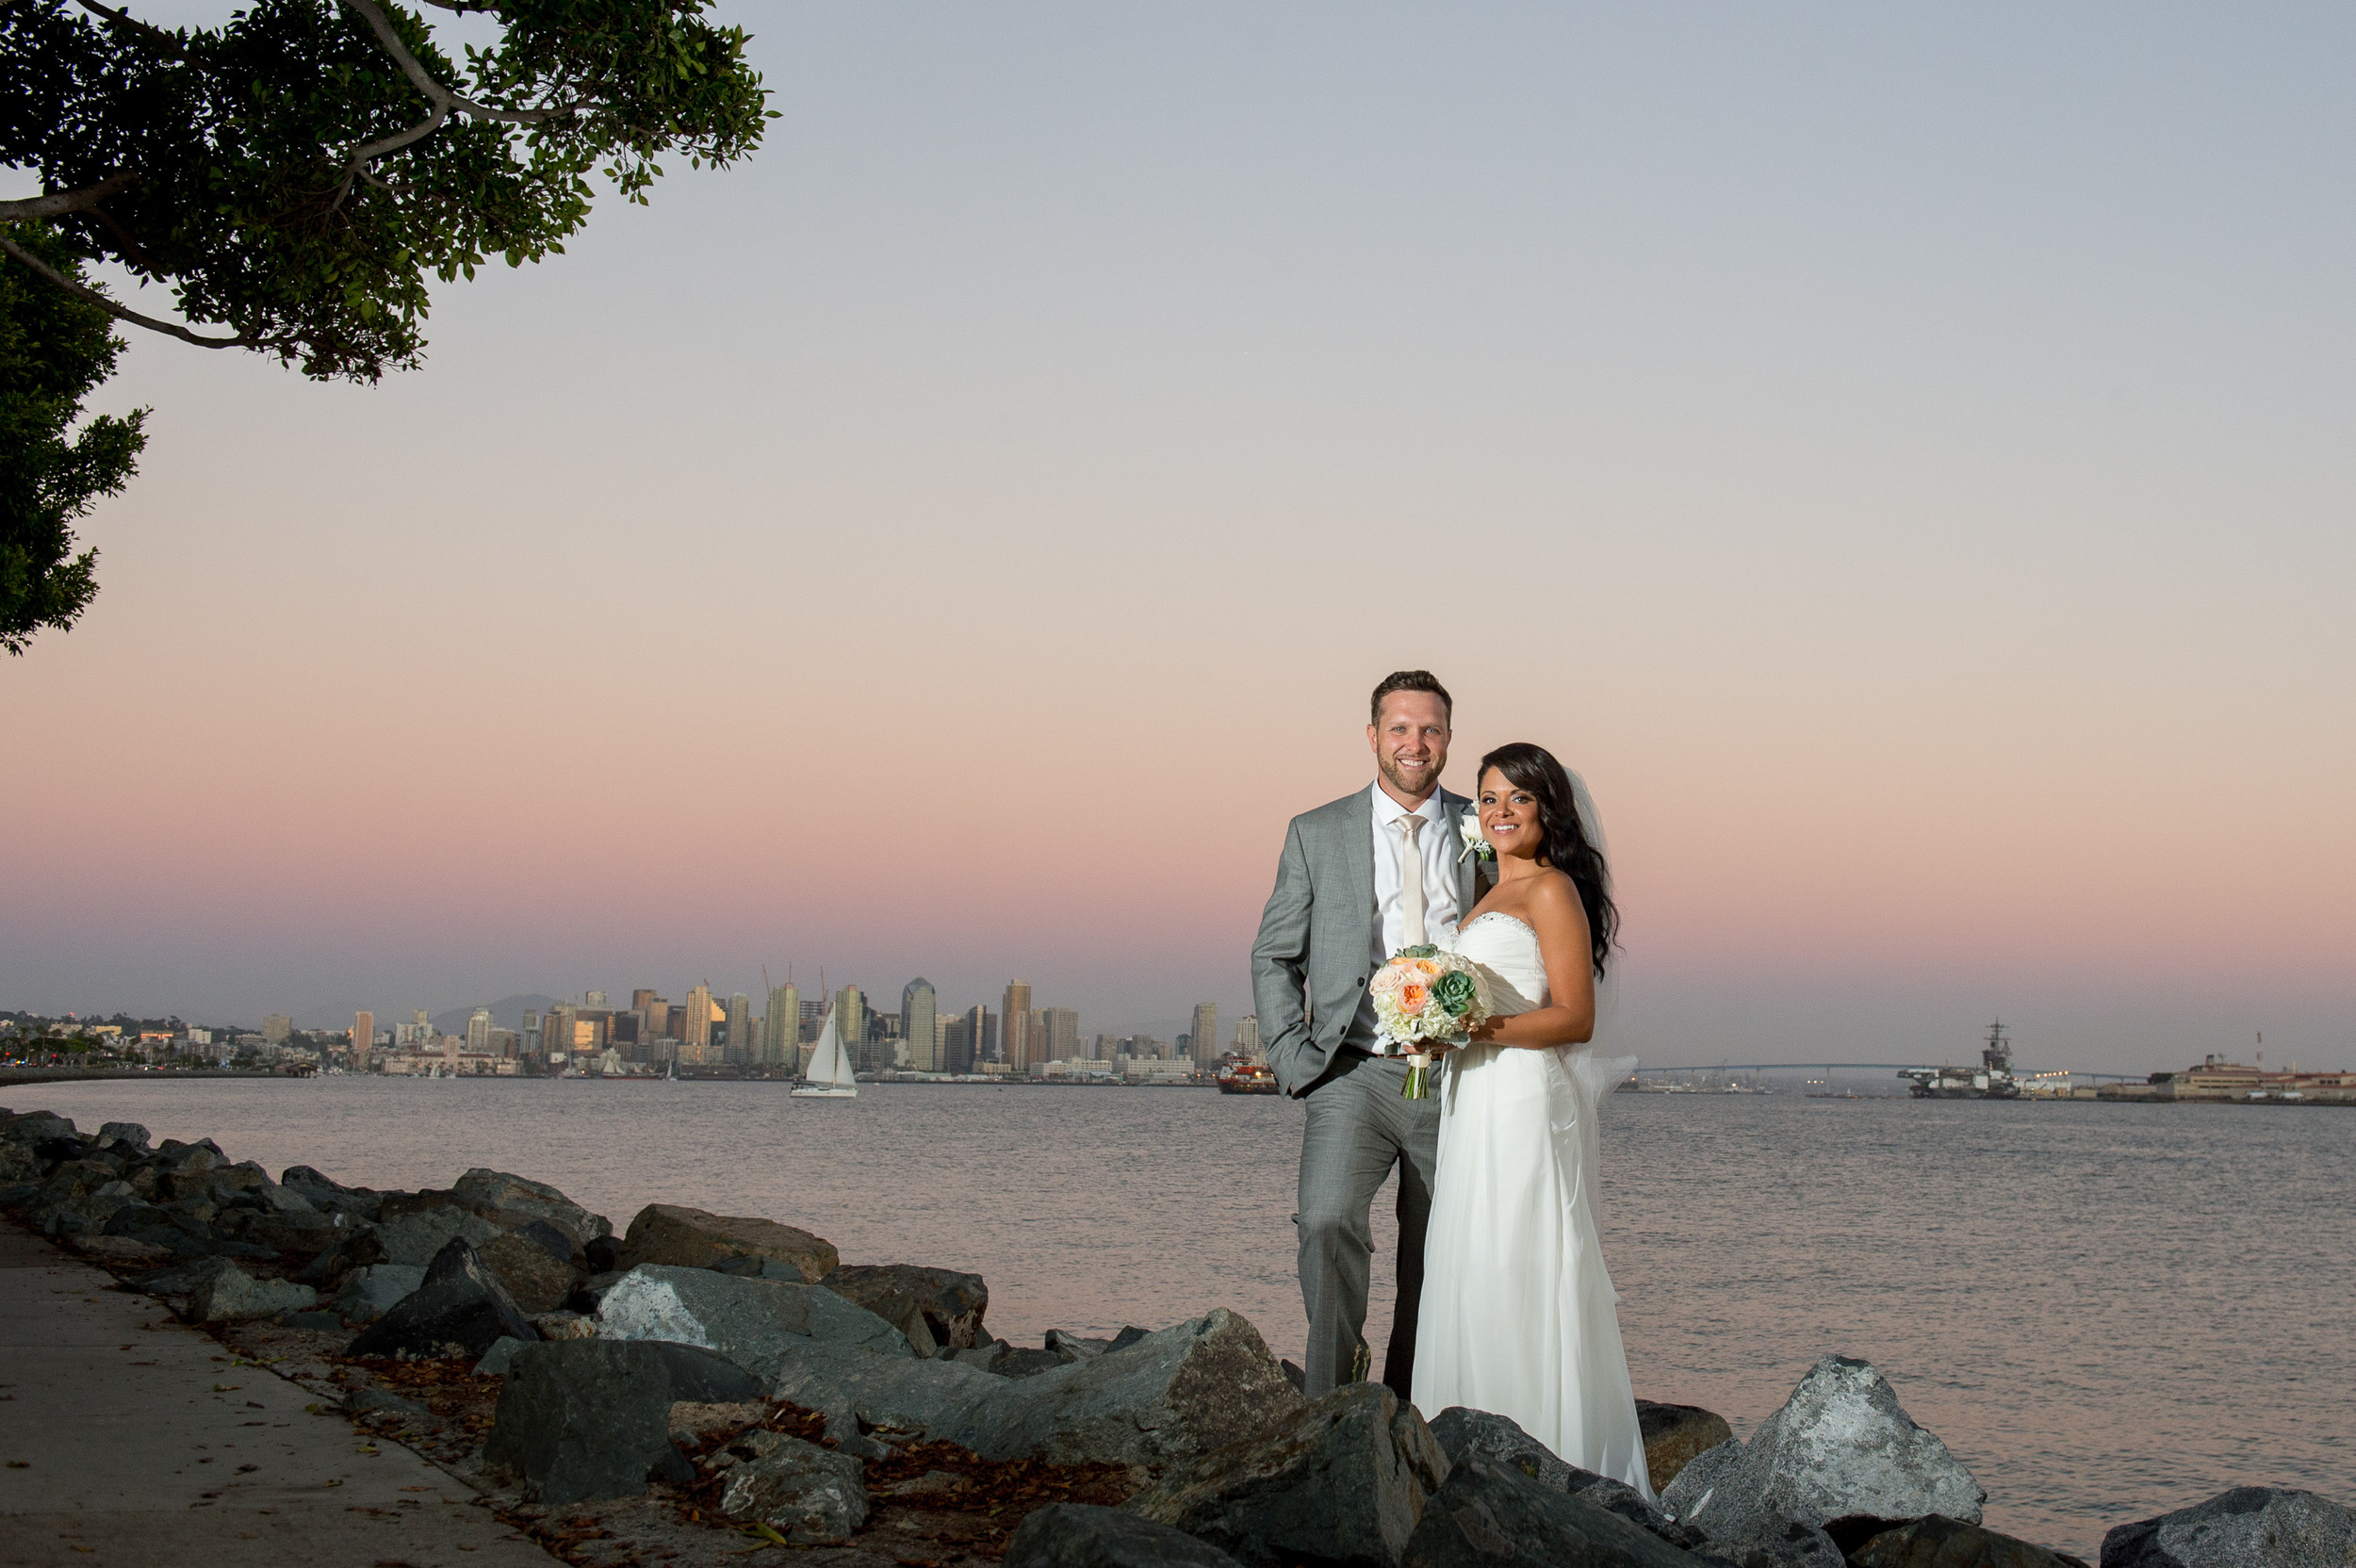 tom-hams-lighthouse-wedding-D04_0117.jpg